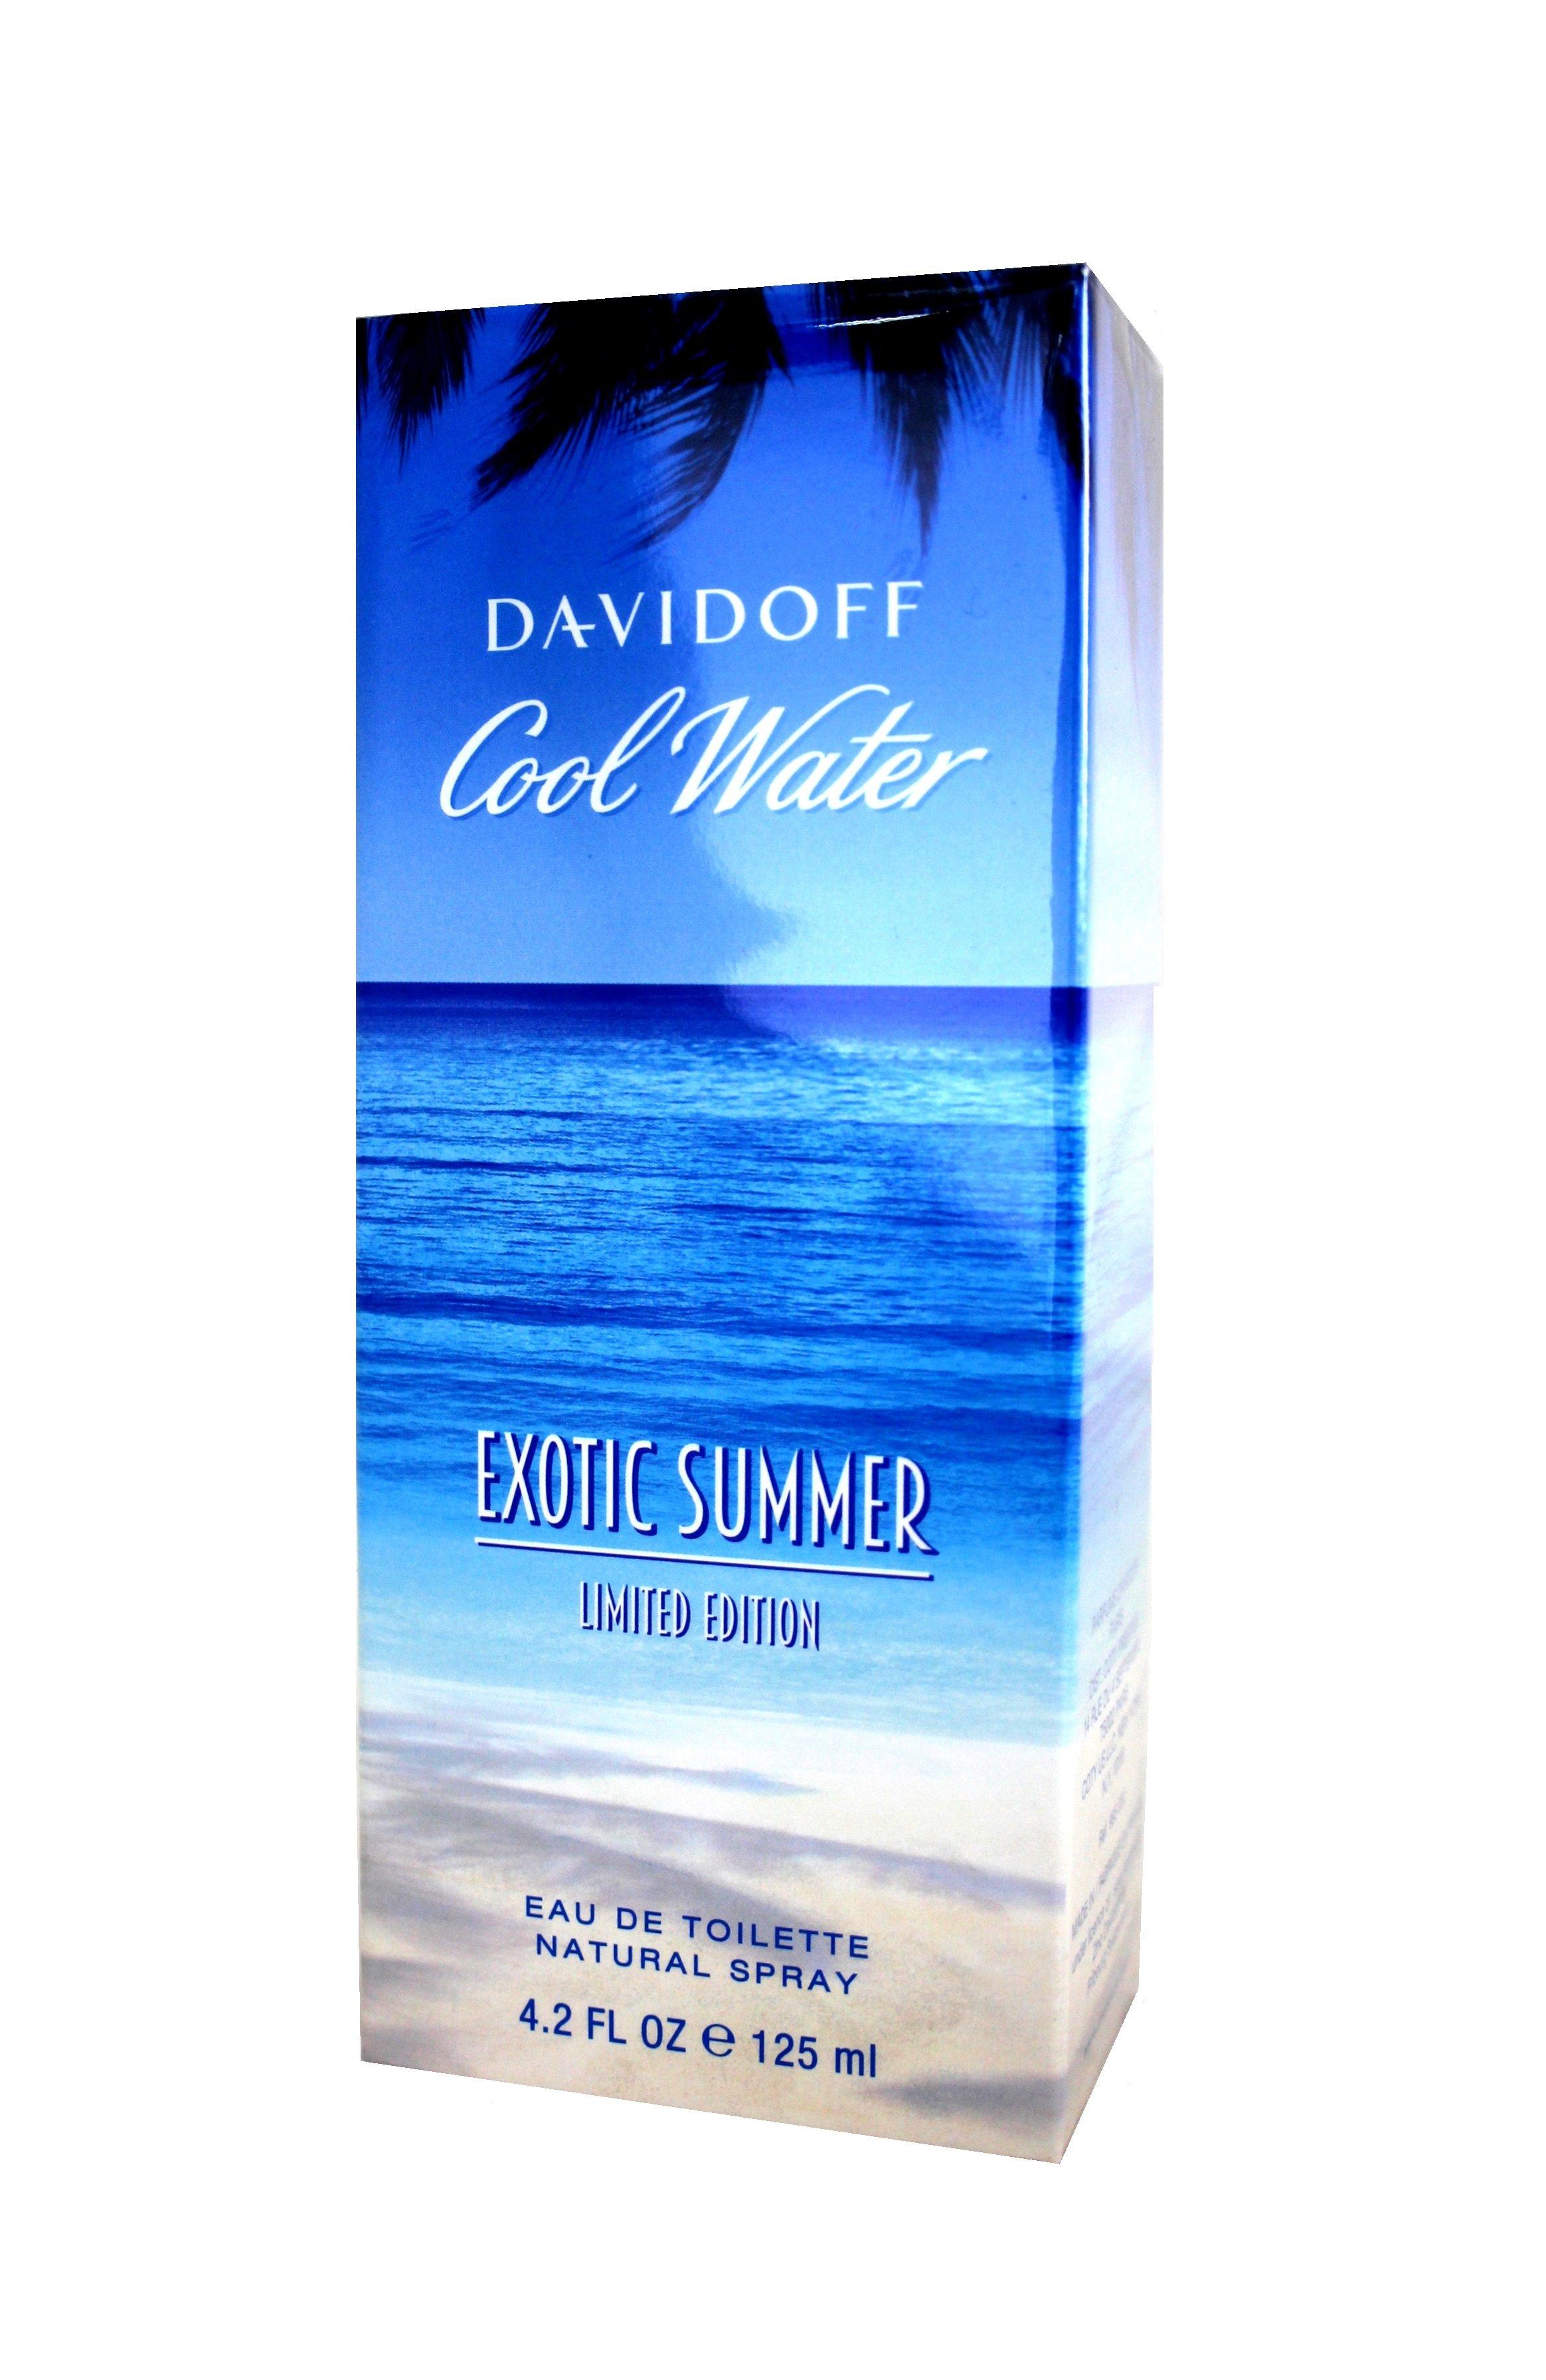 Davidoff Cool Water Exotic Summer Eau de Toilette